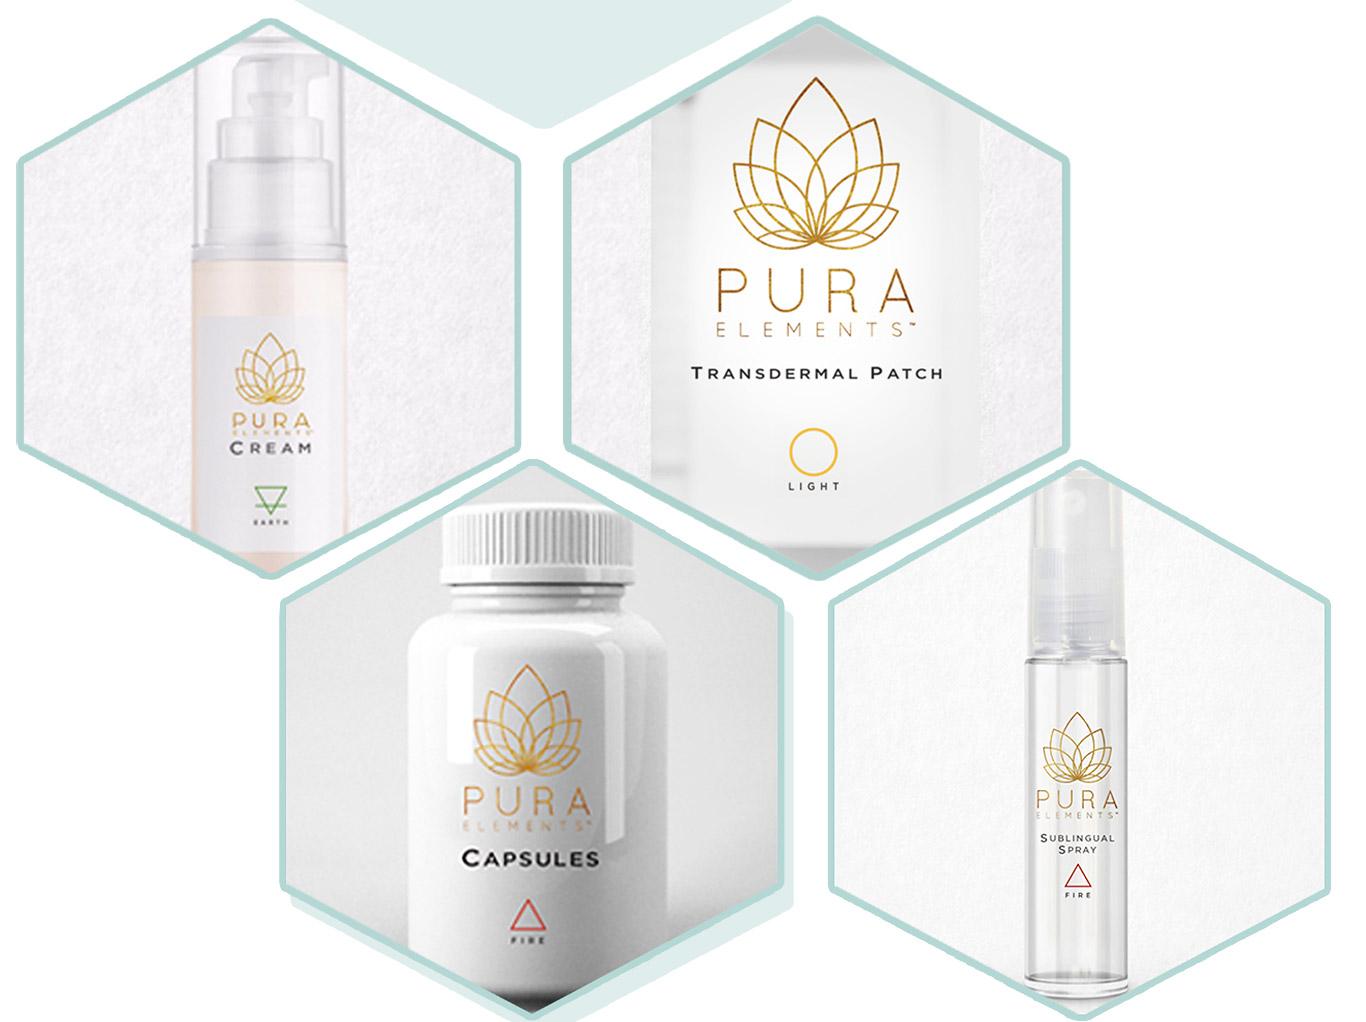 Productos dela empresa samaria Sativa Nativa.